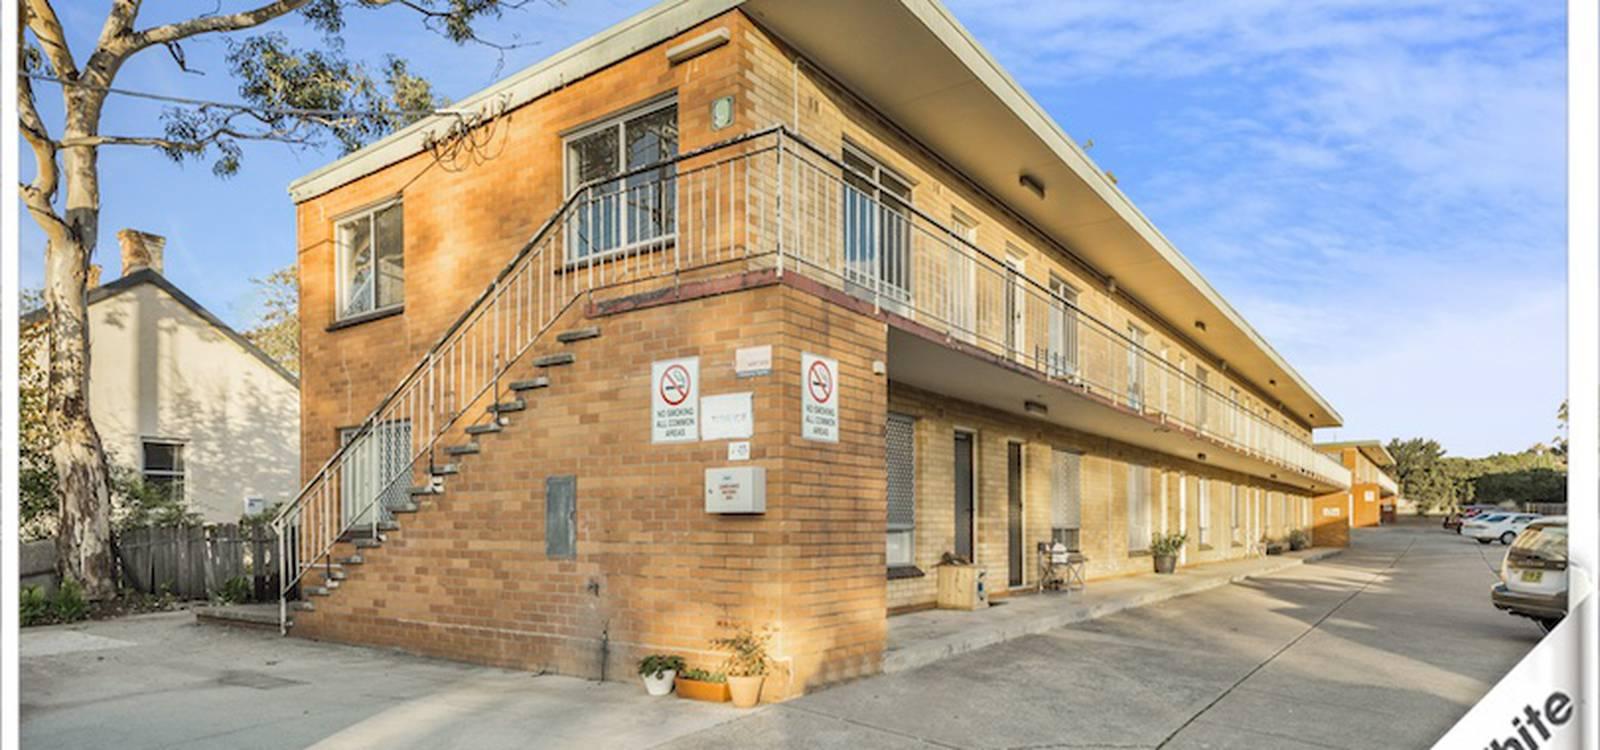 3/9 Macquoid Street QUEANBEYAN, NSW 2620 - photo 1